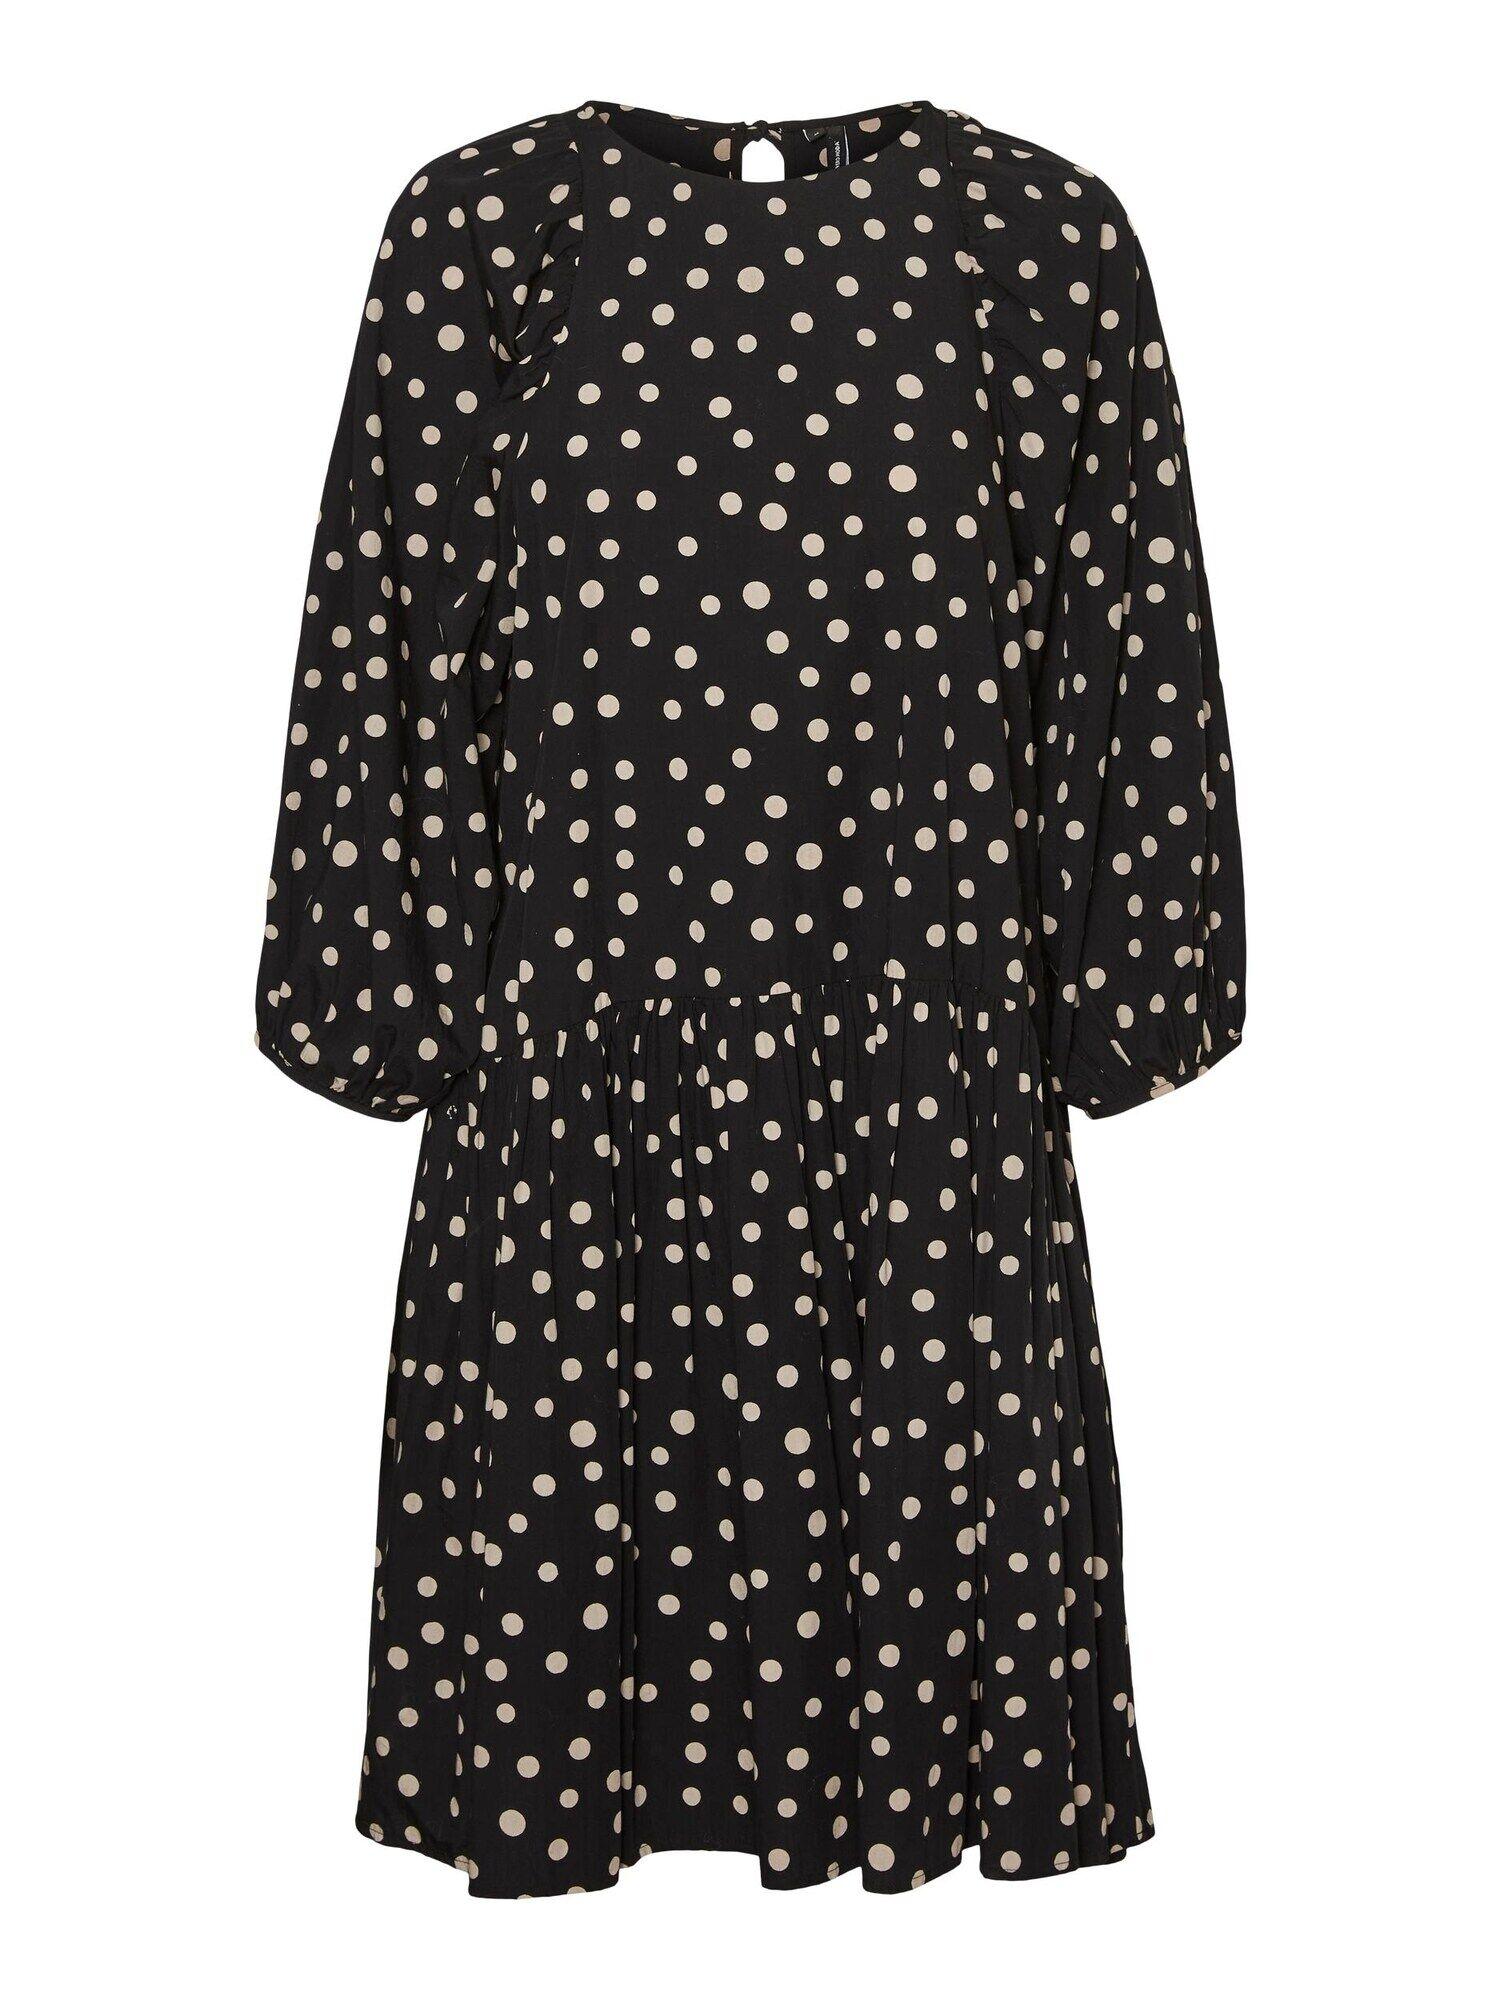 VERO MODA Robe 'Sinna'  - Noir - Taille: XS - female